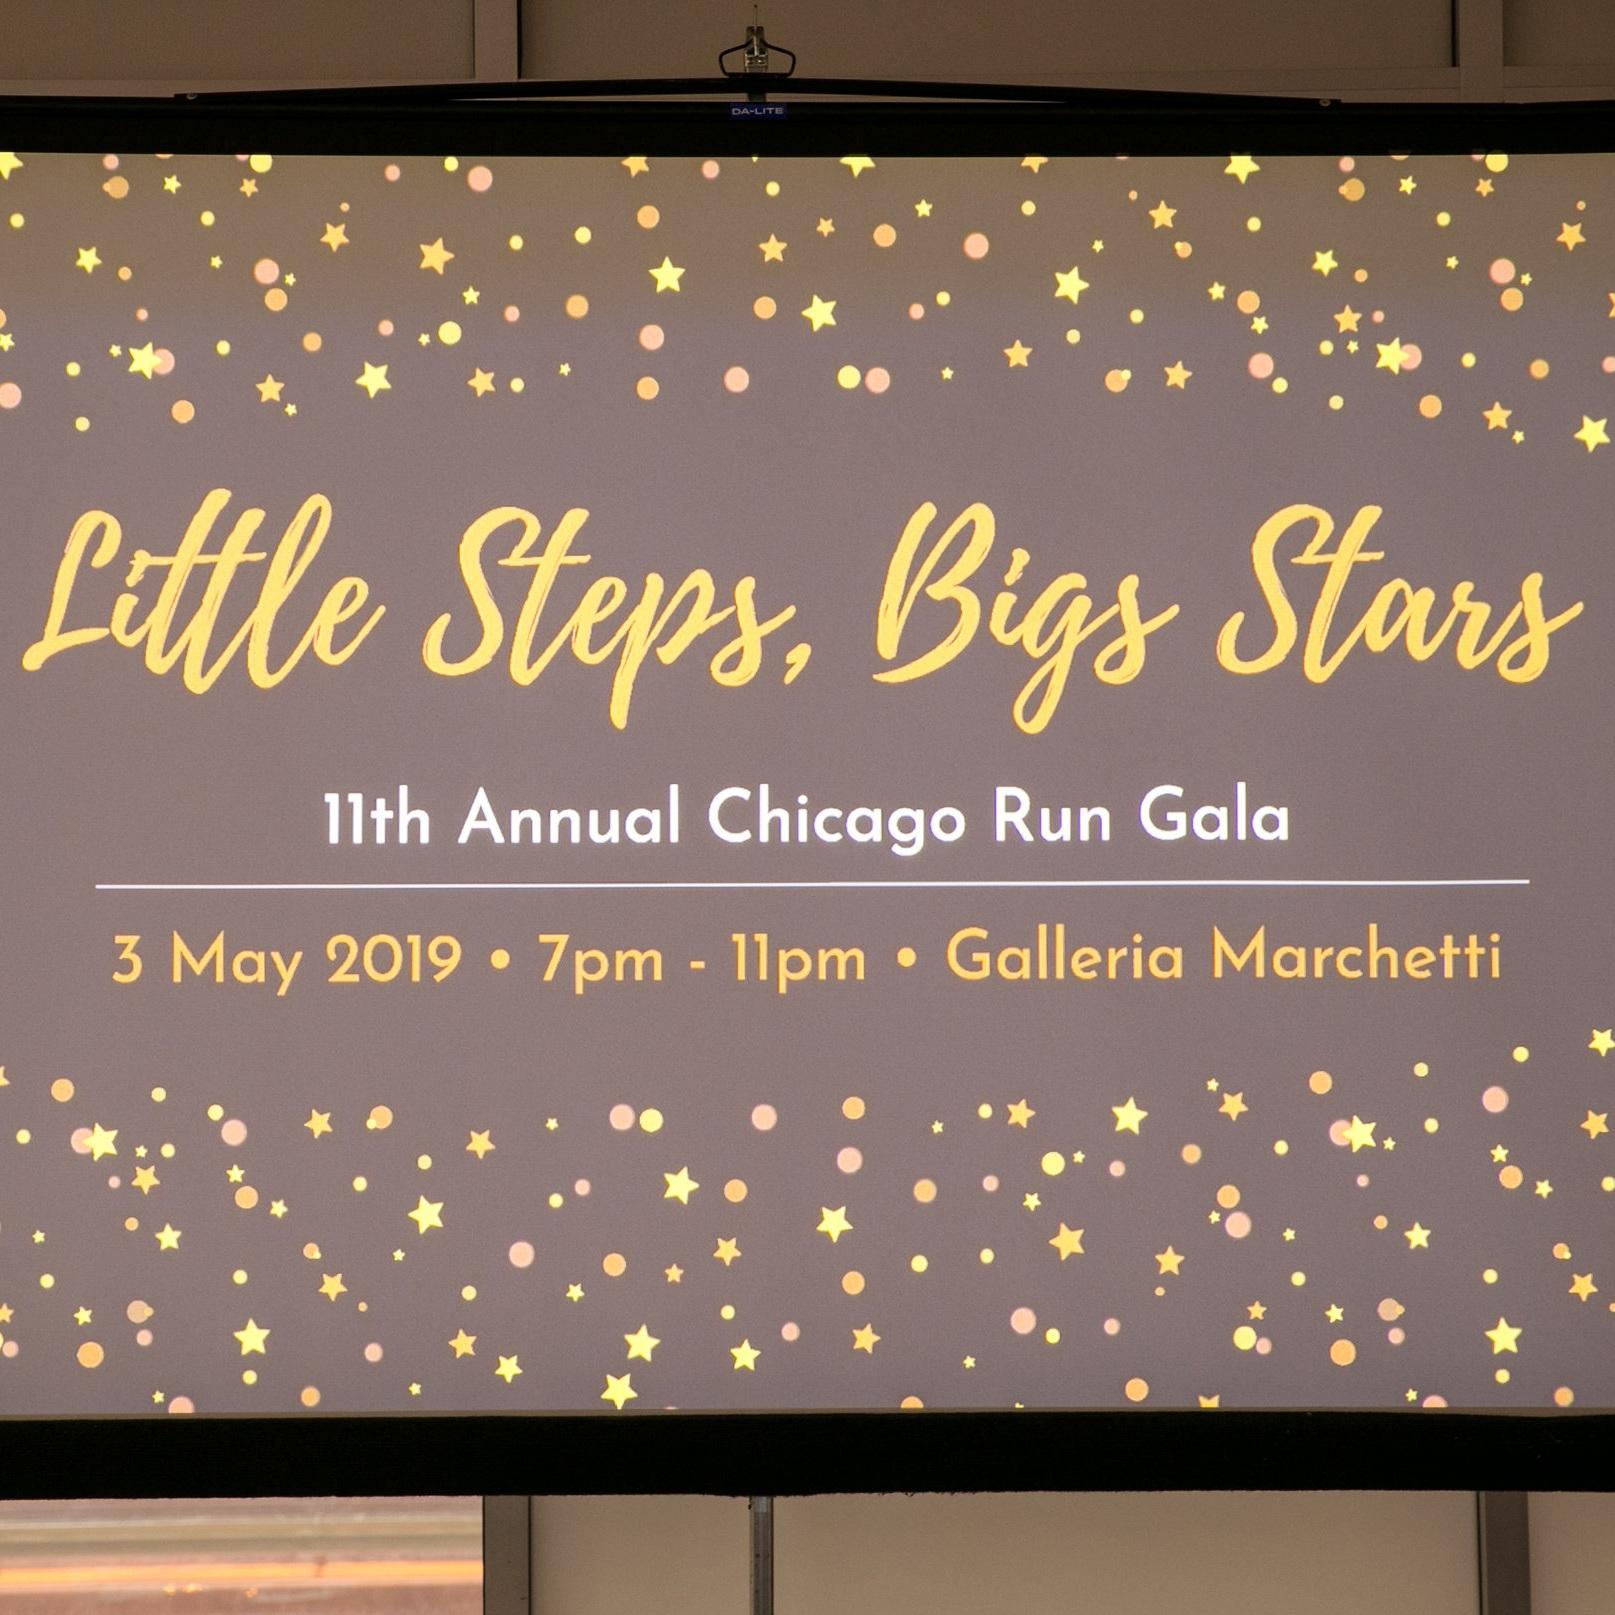 11th Annual Little Steps, Big Stars Gala - May 2019